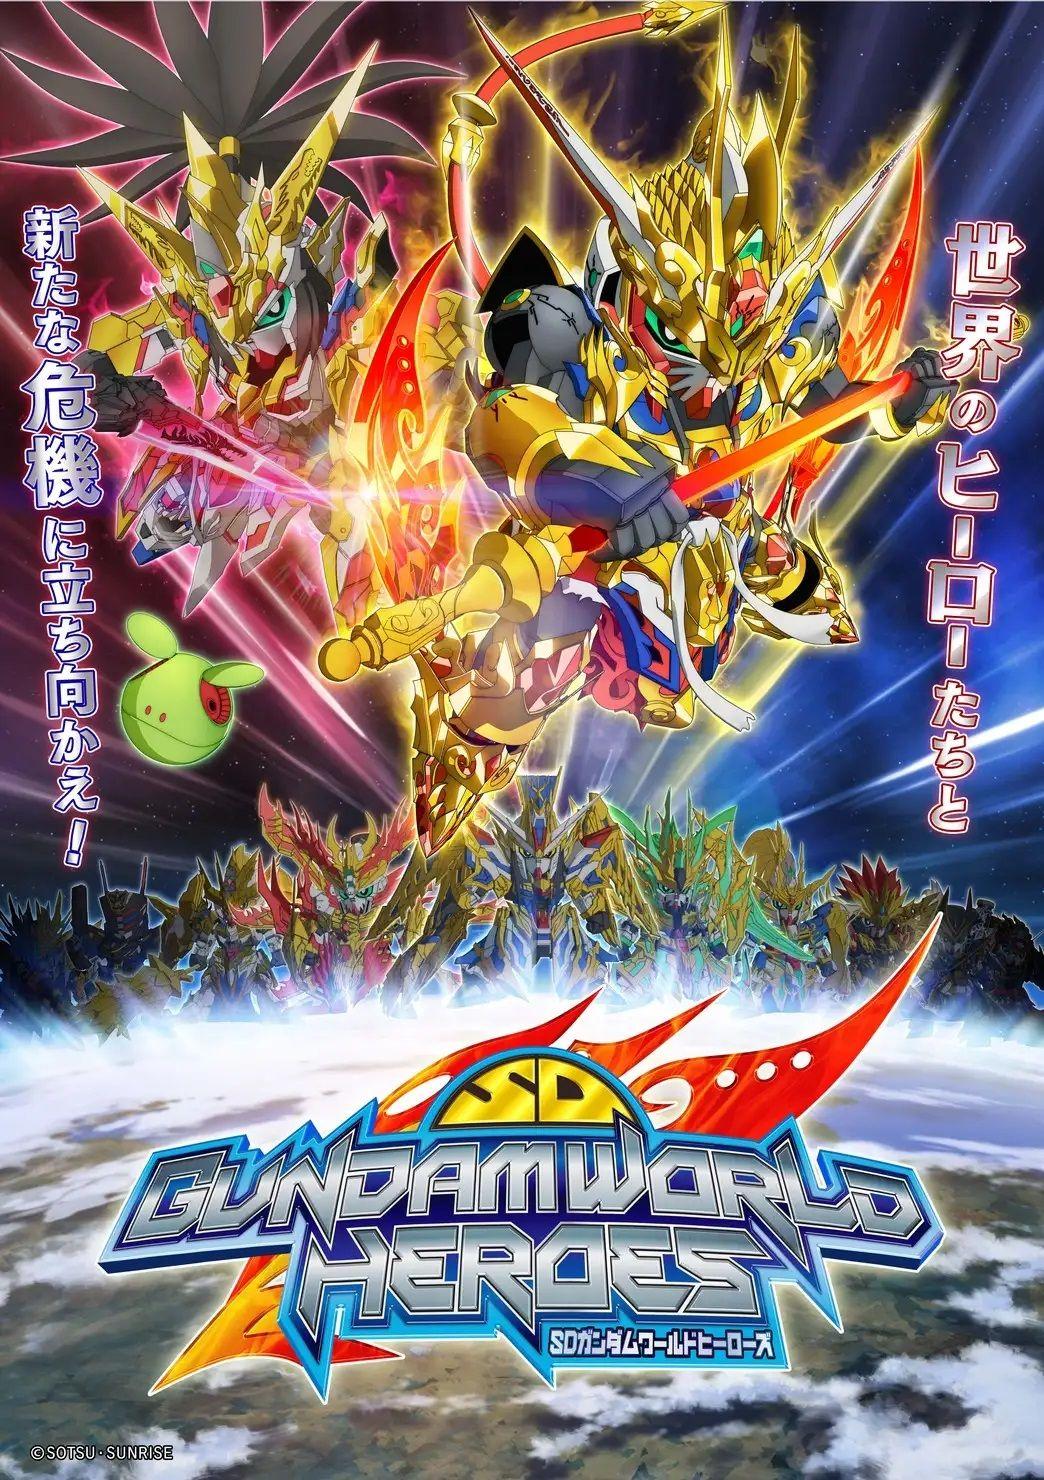 SD Gundam World Heroes Episode 22 Release Date, And Spoilers Release Date And Spoilers